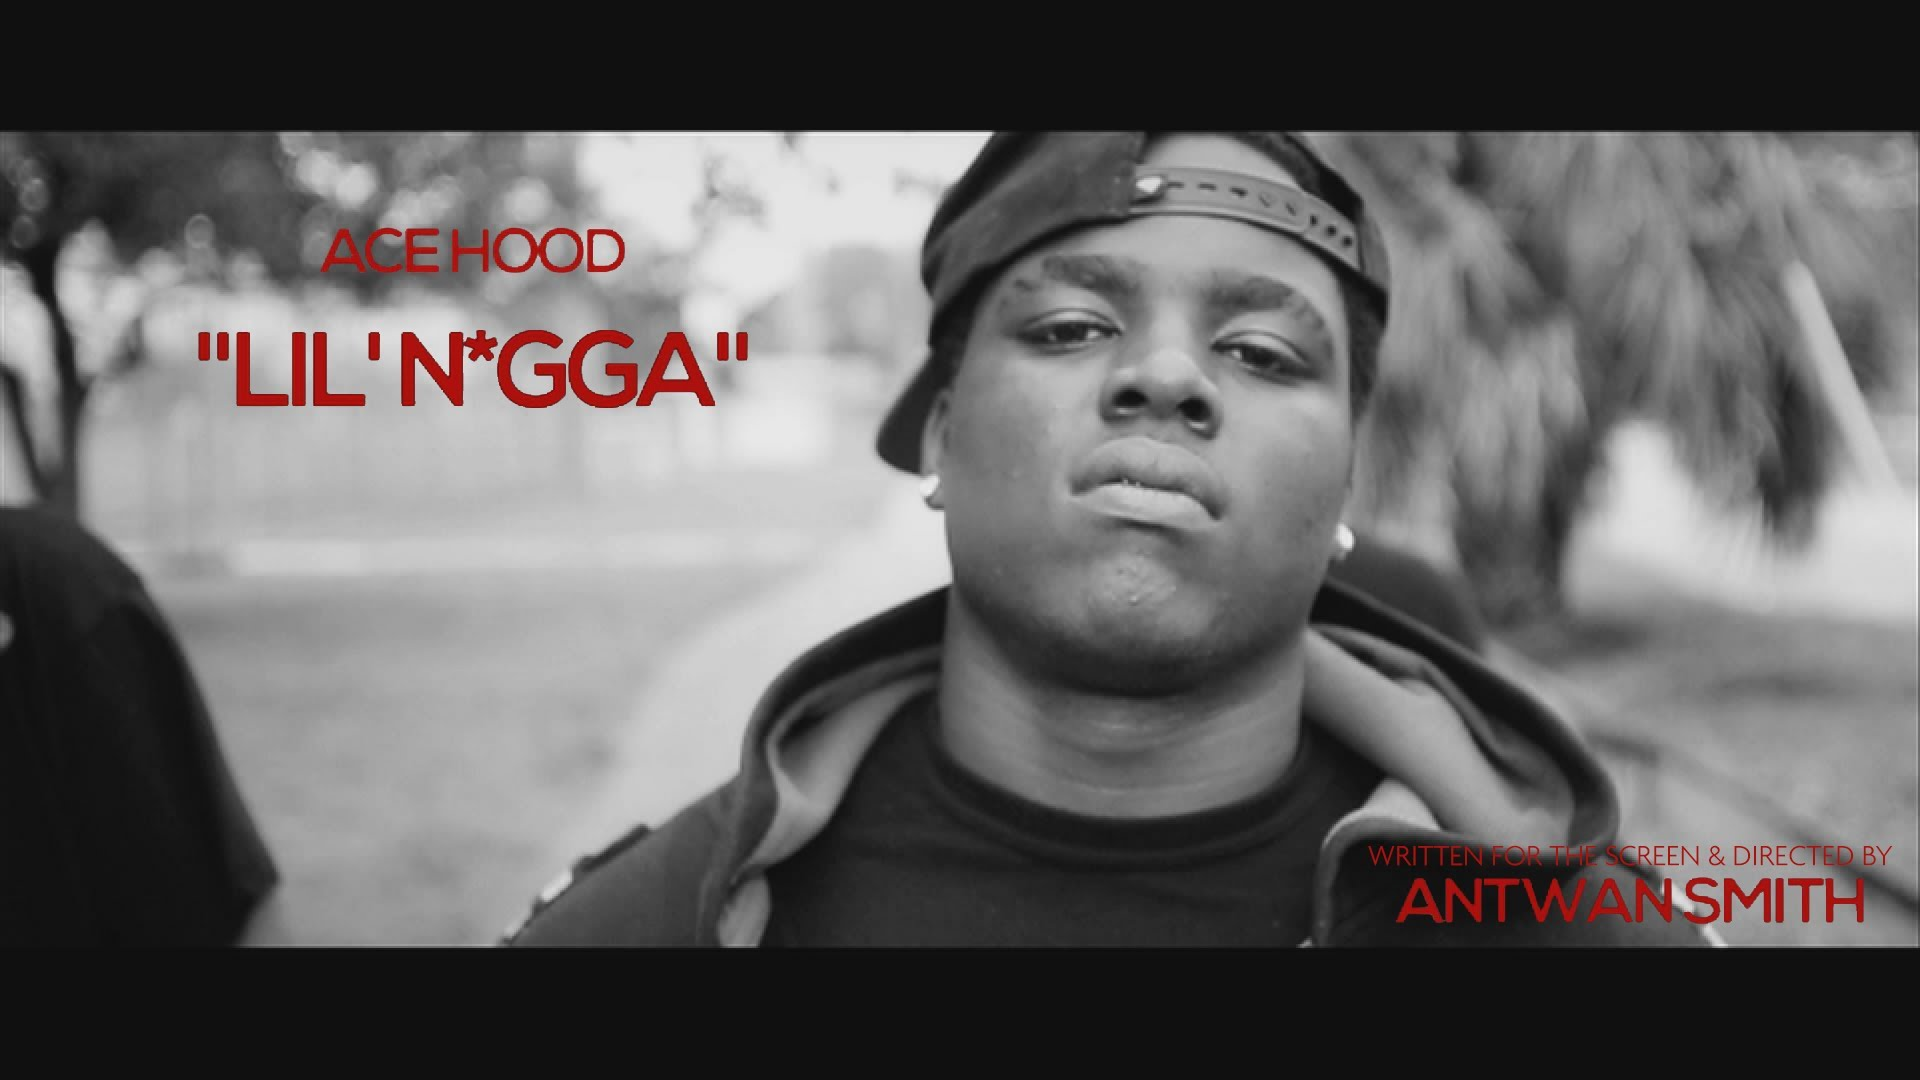 Ace Hood – Lil N*gga (Interlude) [VMG Approved]